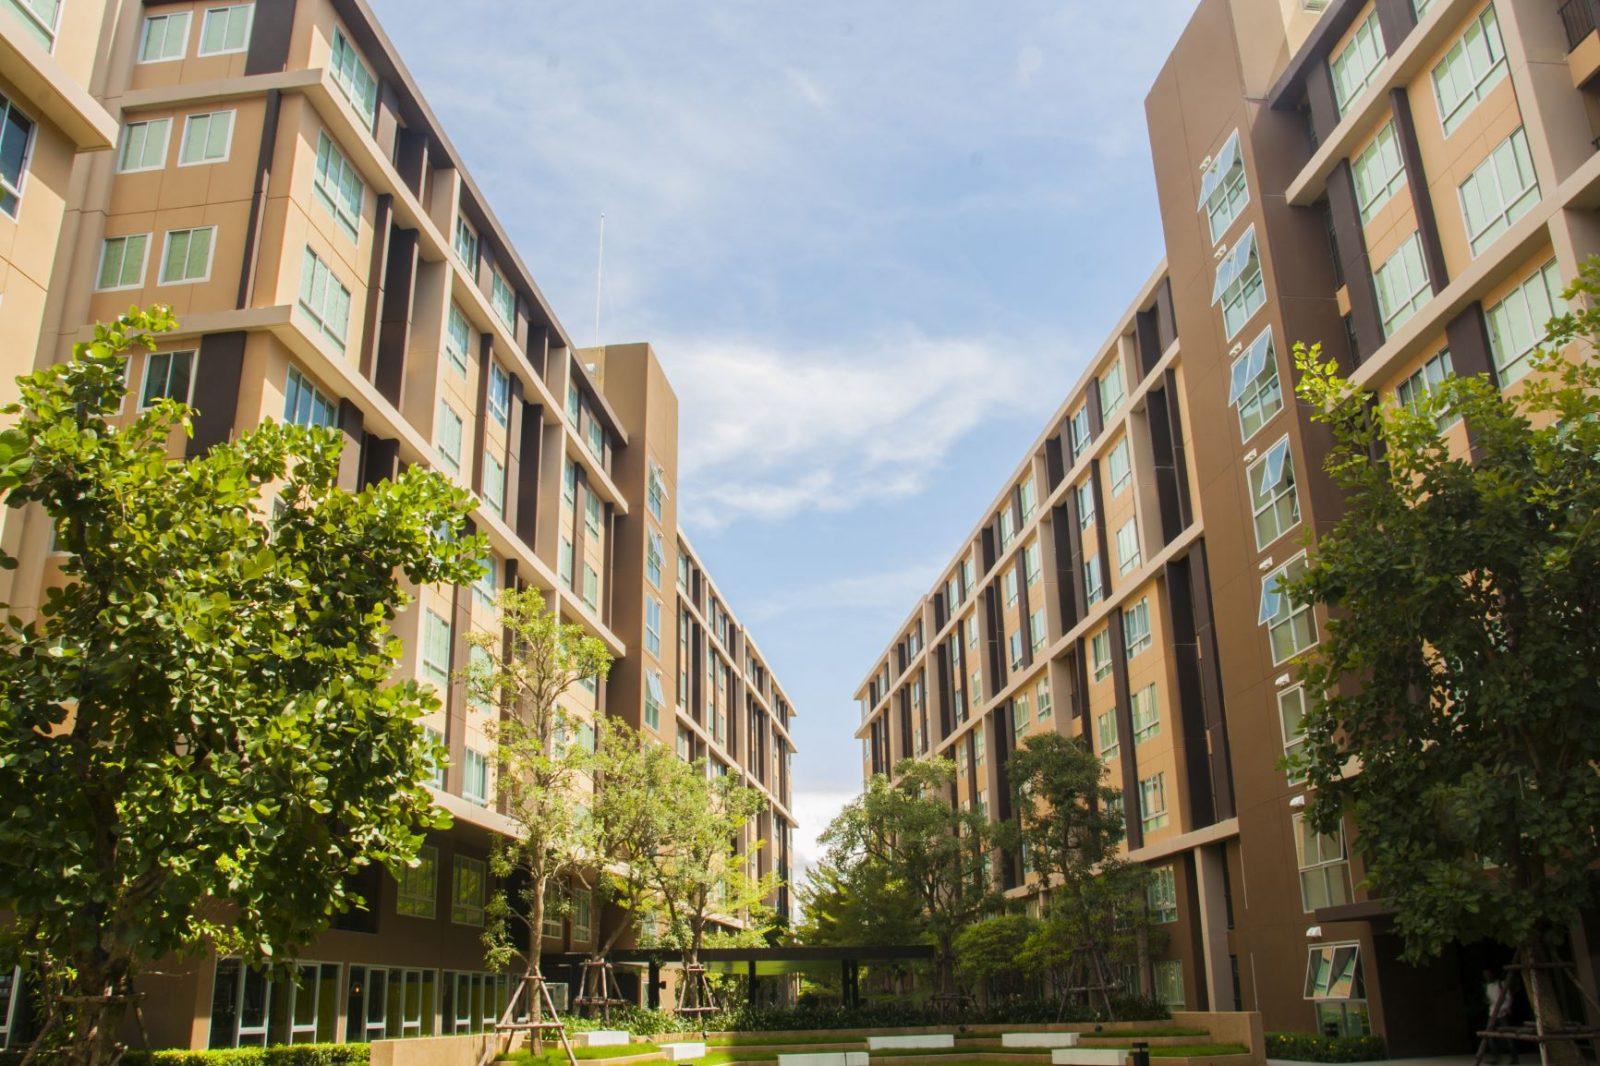 7 Benefits Of Student Housing 4